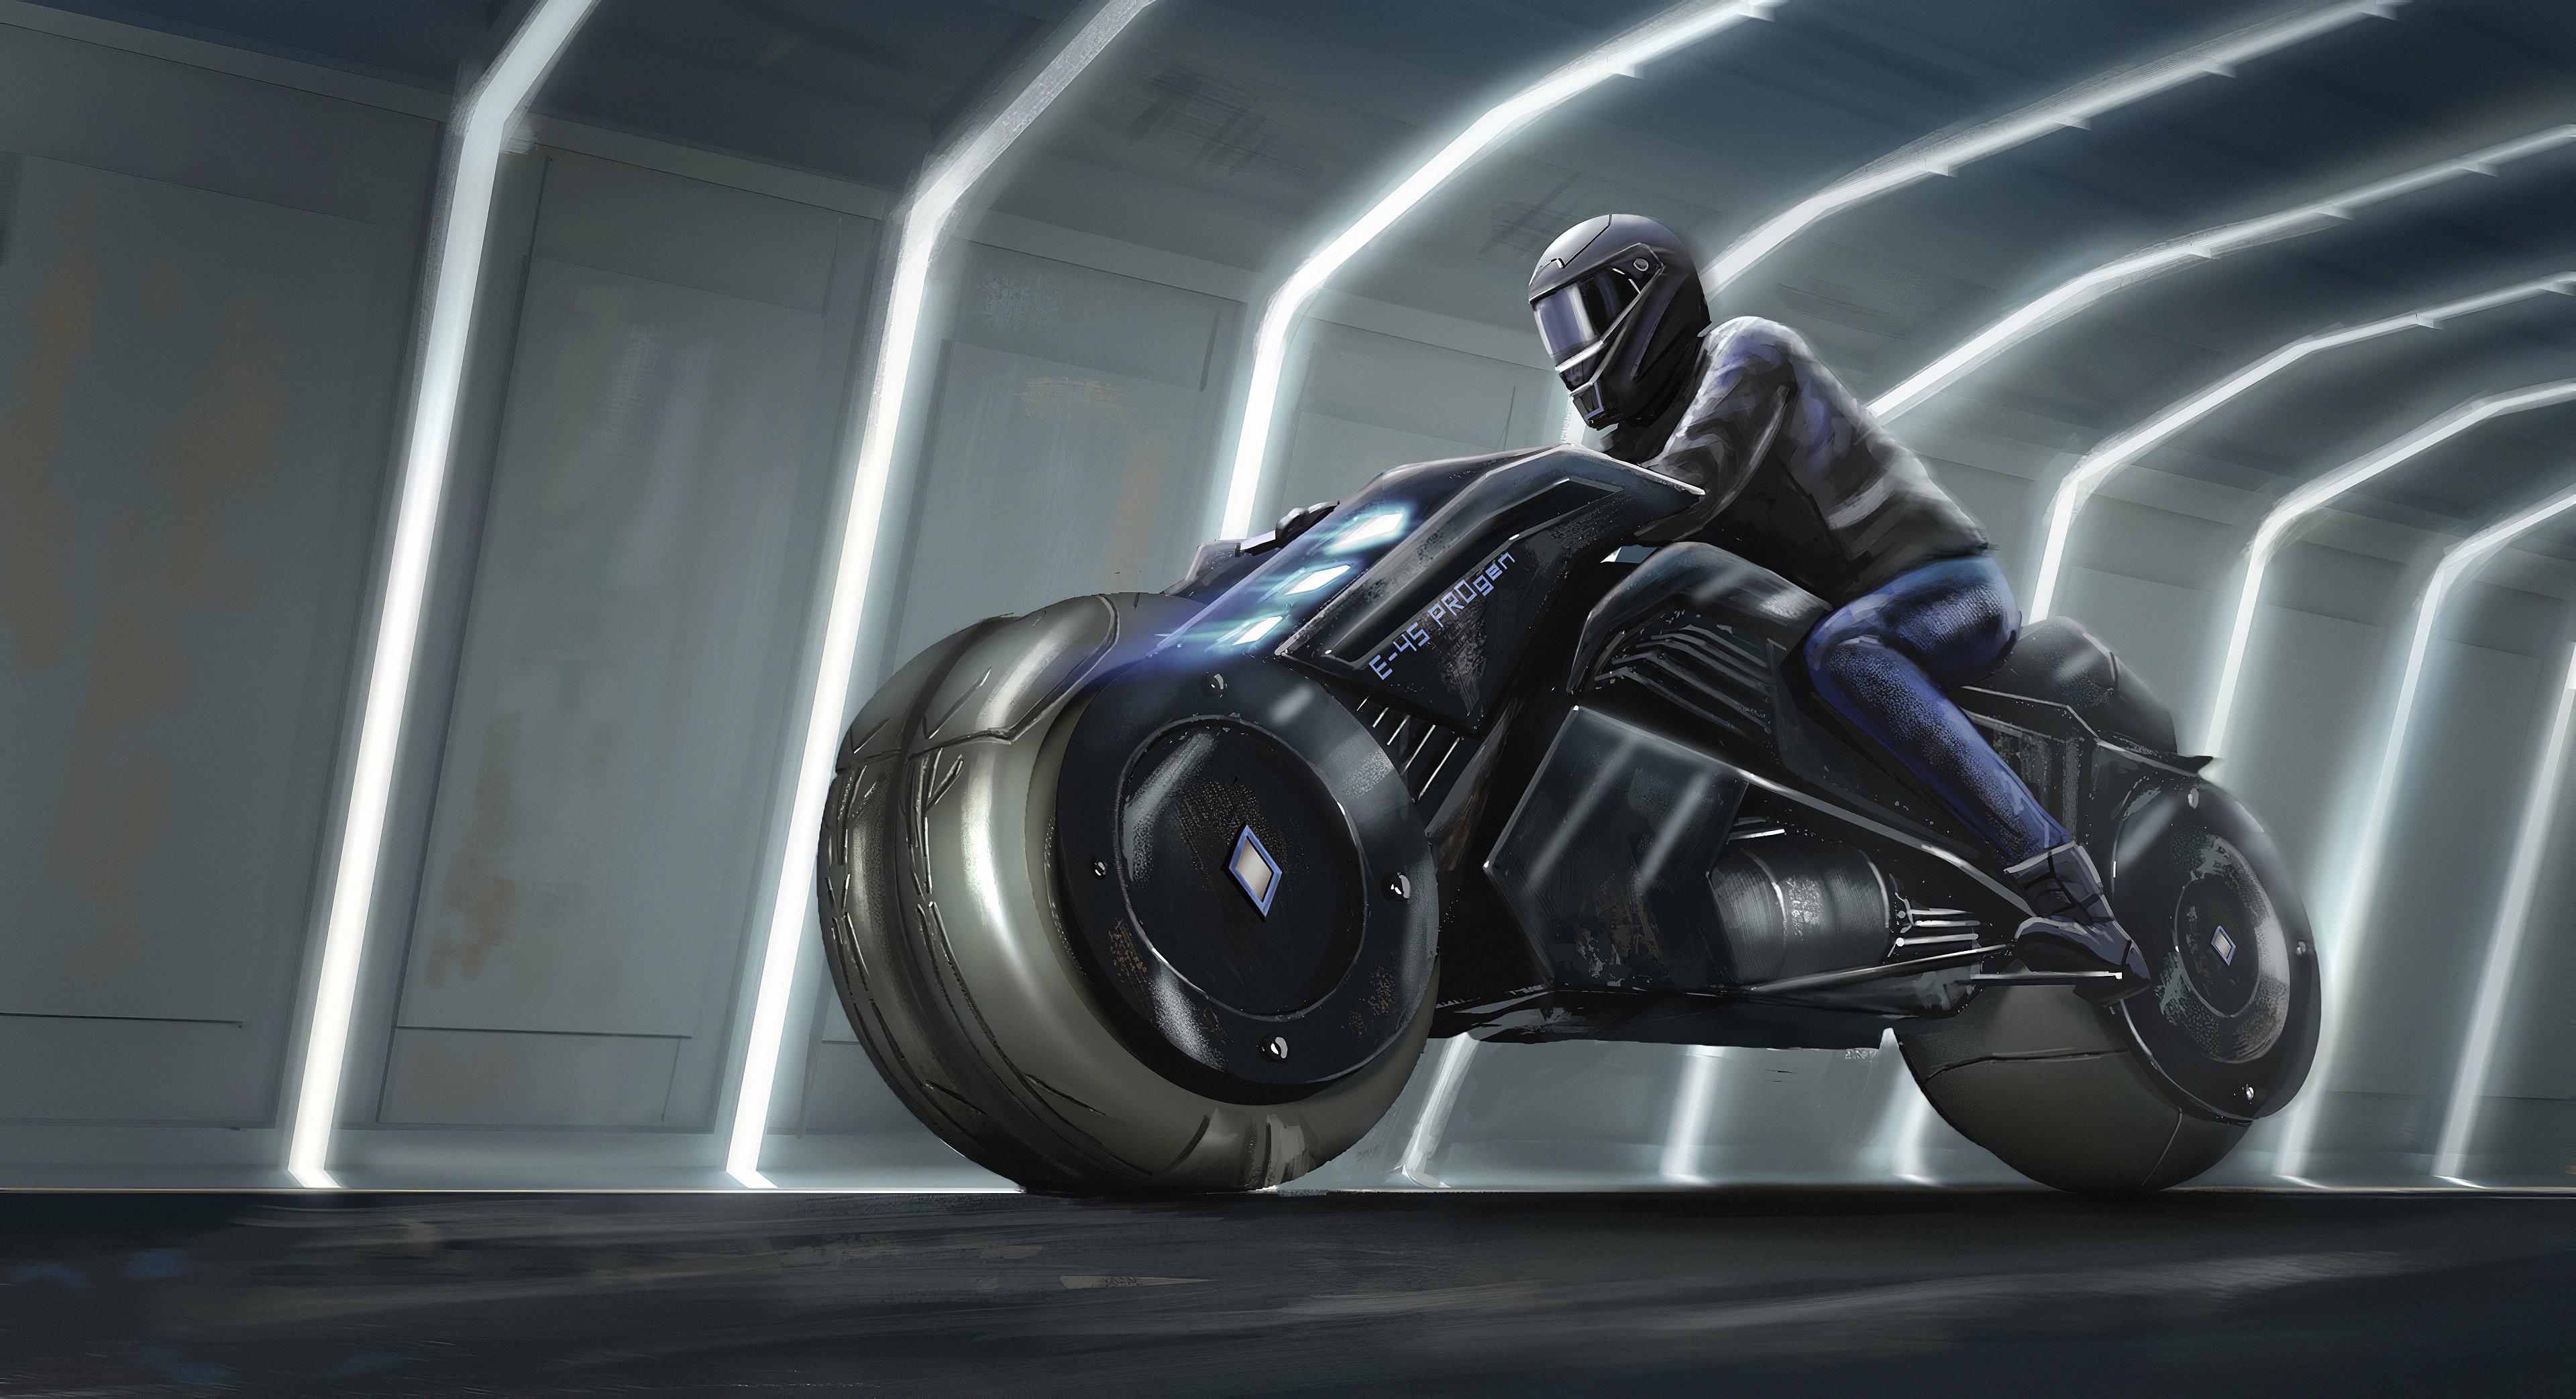 turbo bike 1578254793 - Turbo Bike -